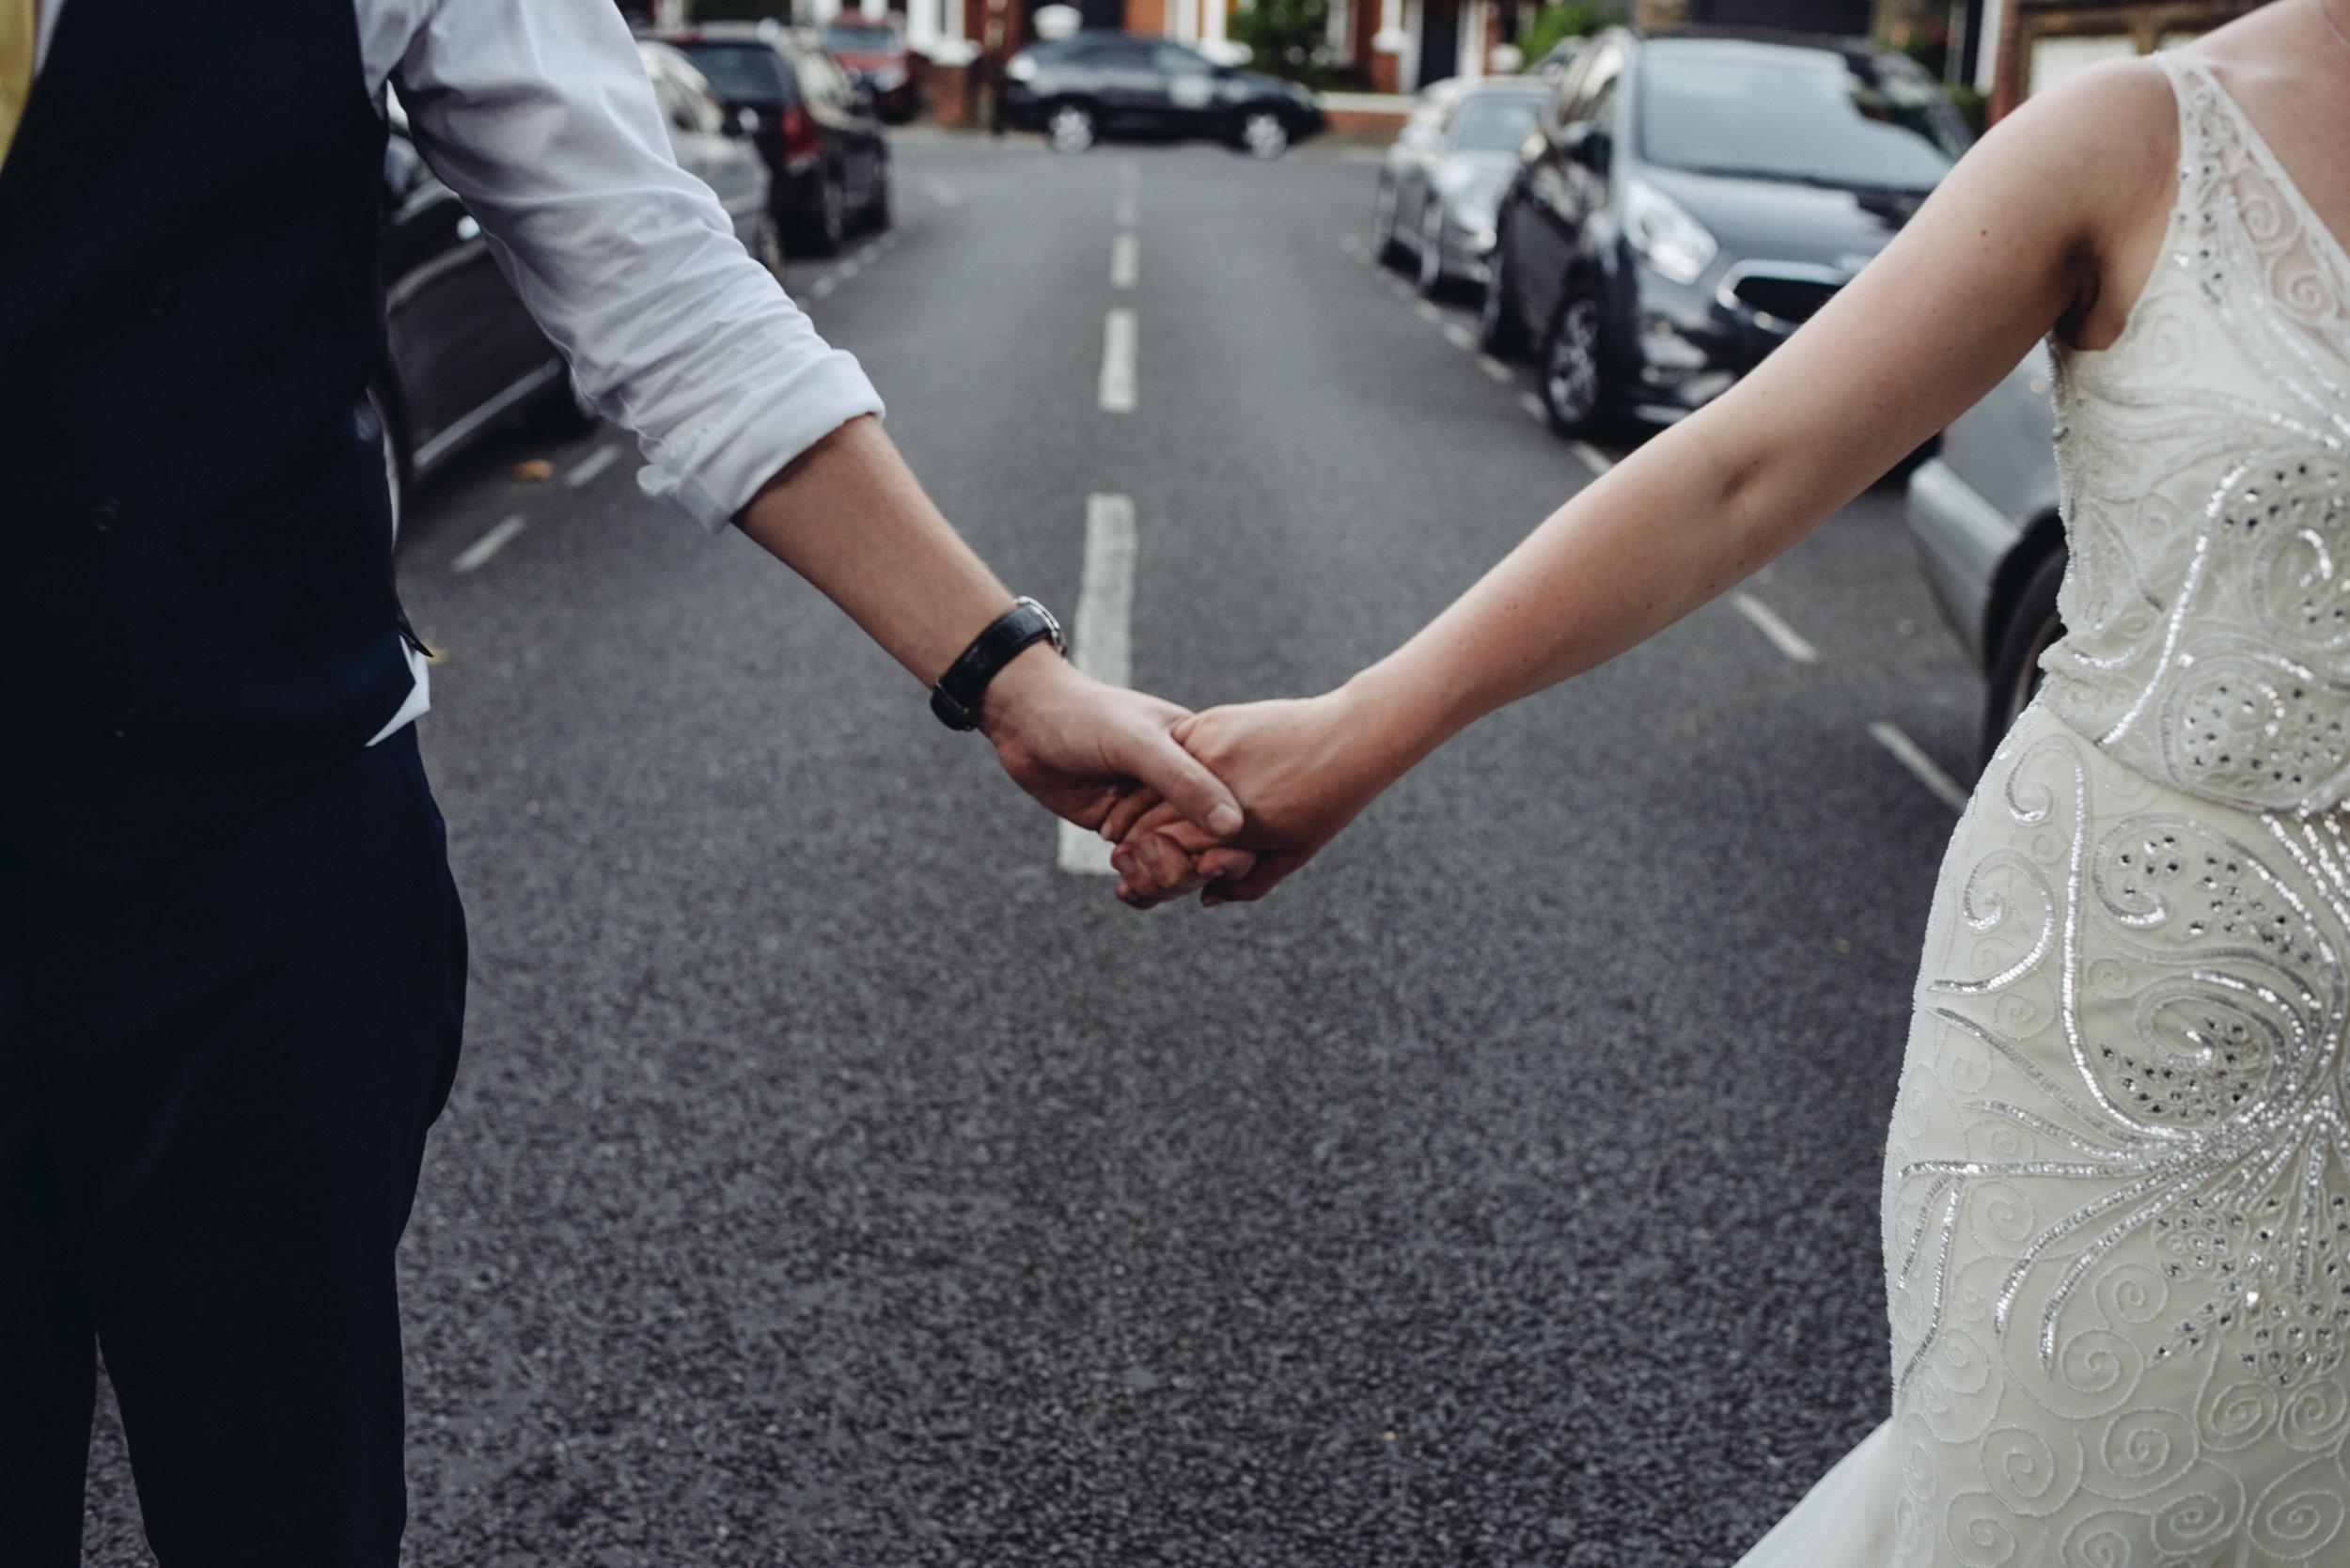 0234-LISA-DEVINE-PHOTOGRAPHY-ALTERNATIVE-WEDDING-PHOTOGRAPHY-SCOTLAND-DESTINATION-WEDDINGS-GLASGOW-WEDDINGS-COOL-WEDDINGS-STYLISH-WEDDINGS.JPG